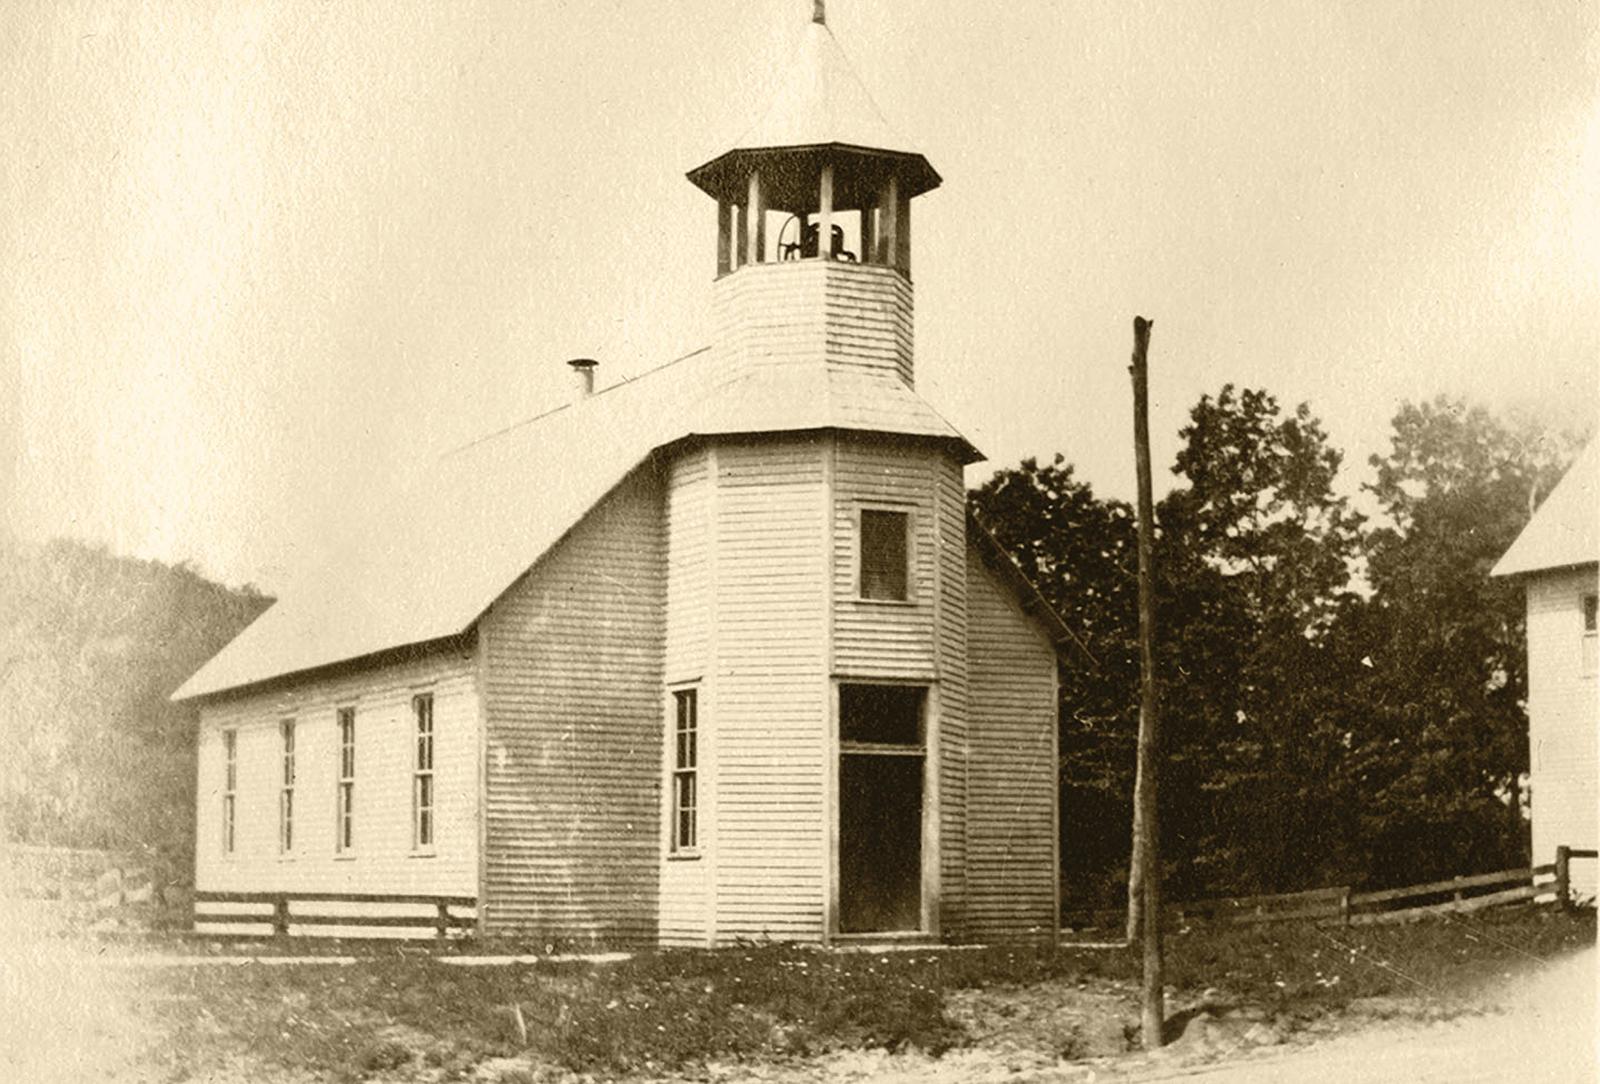 highlands nc Methodist Church 1909